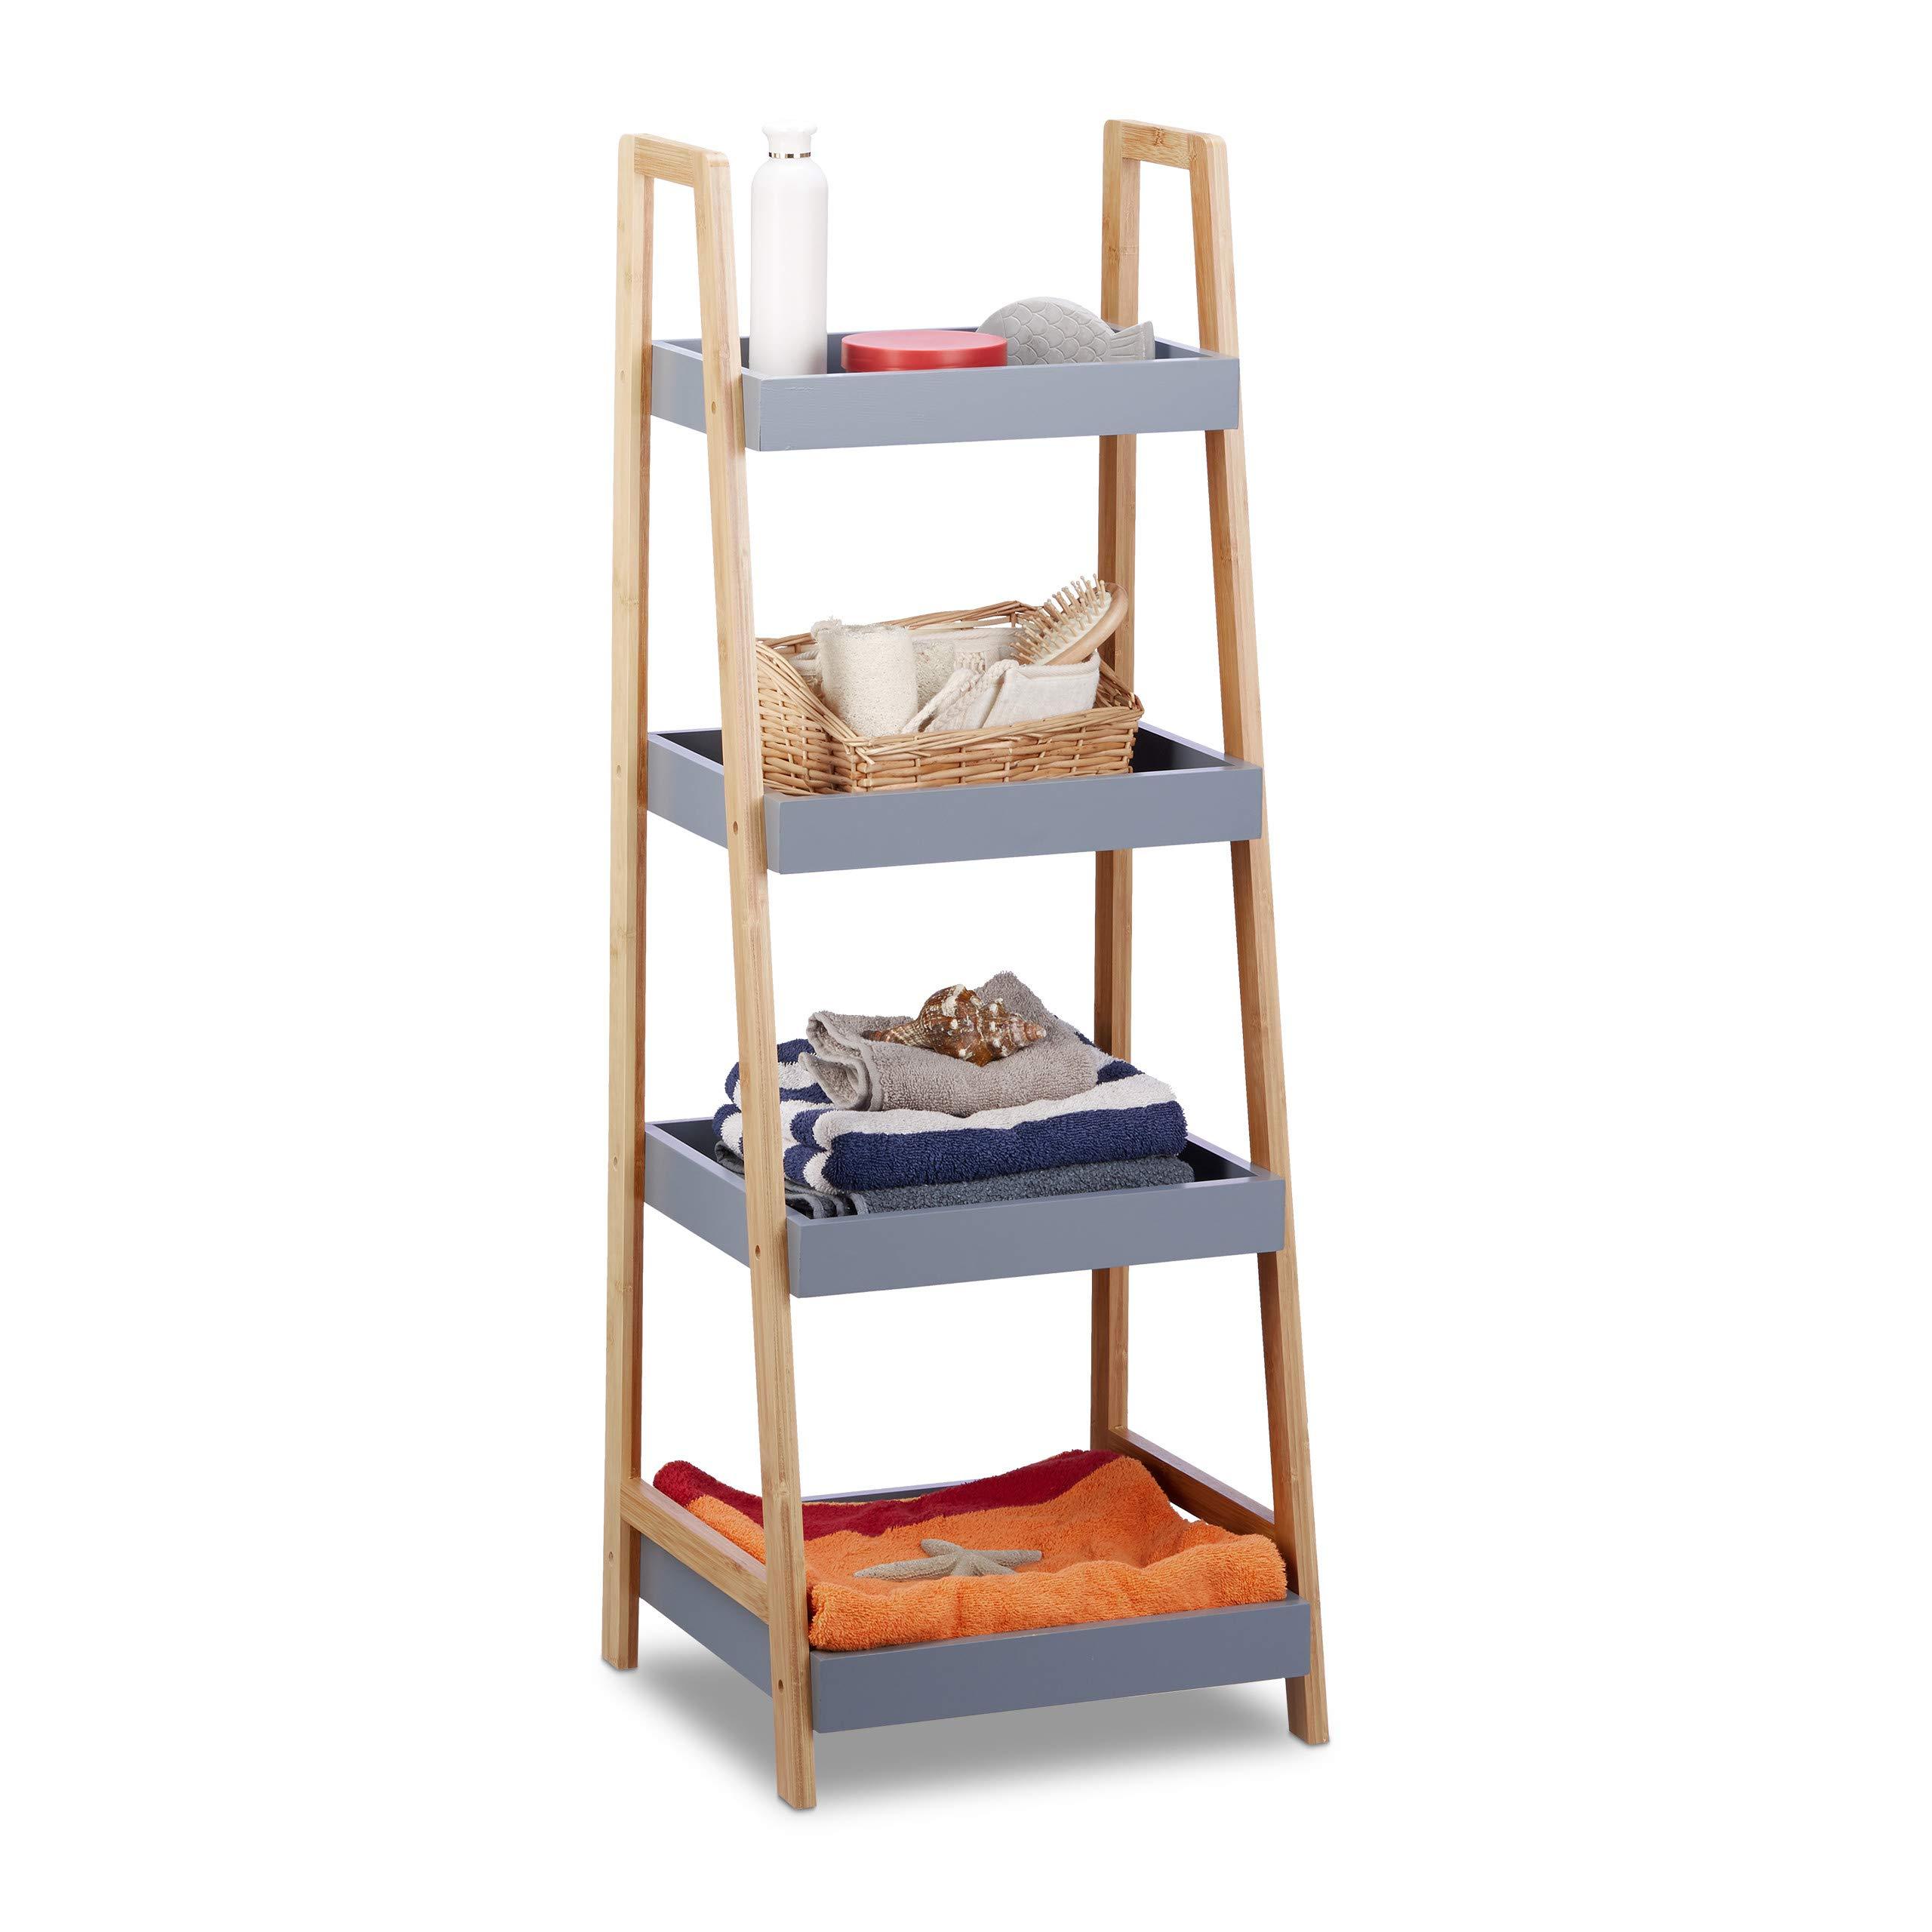 Relaxdays estantería de baño, Cuatro estantes, Madera, Organizador de Cocina, Gris, 98 x 36 x 34,5 cm: Amazon.es: Hogar